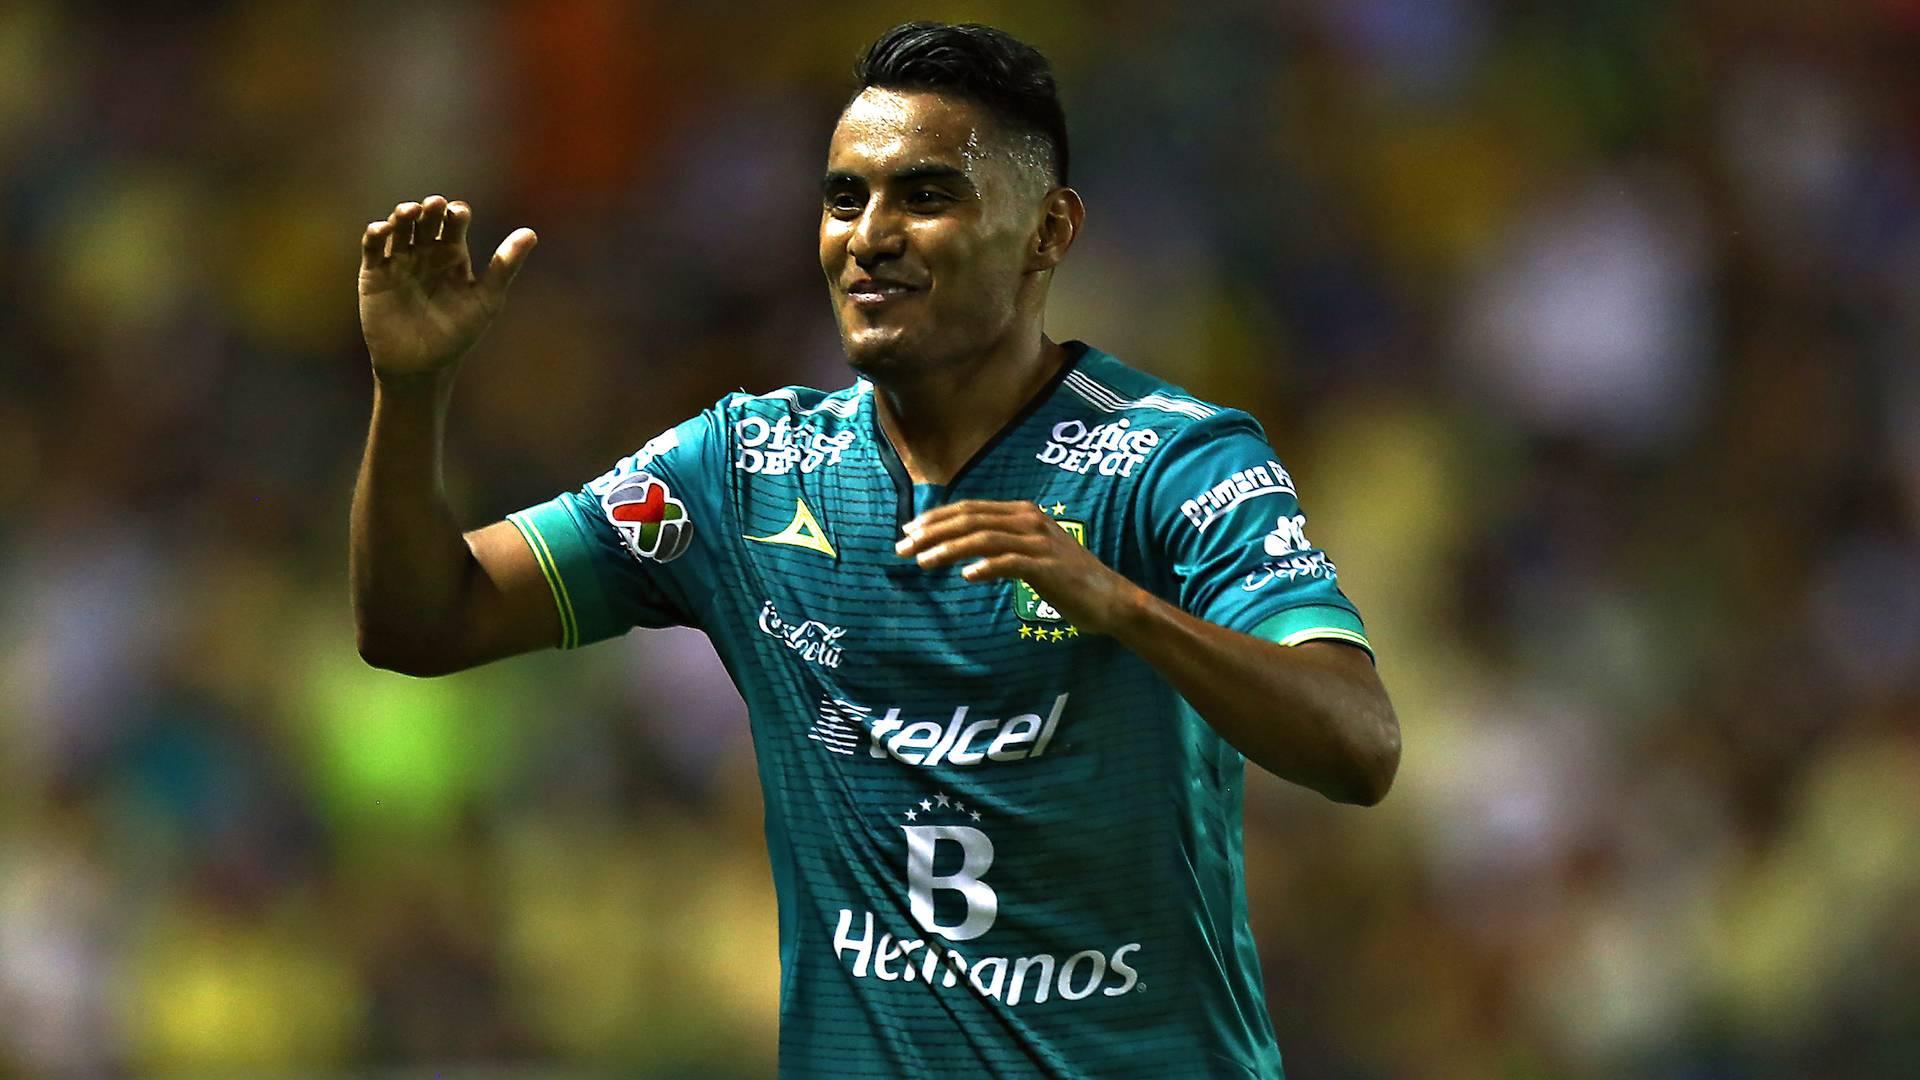 ¡Volvió el Gallito! José Juan Vázquez deja Santos para regresar a Chivas